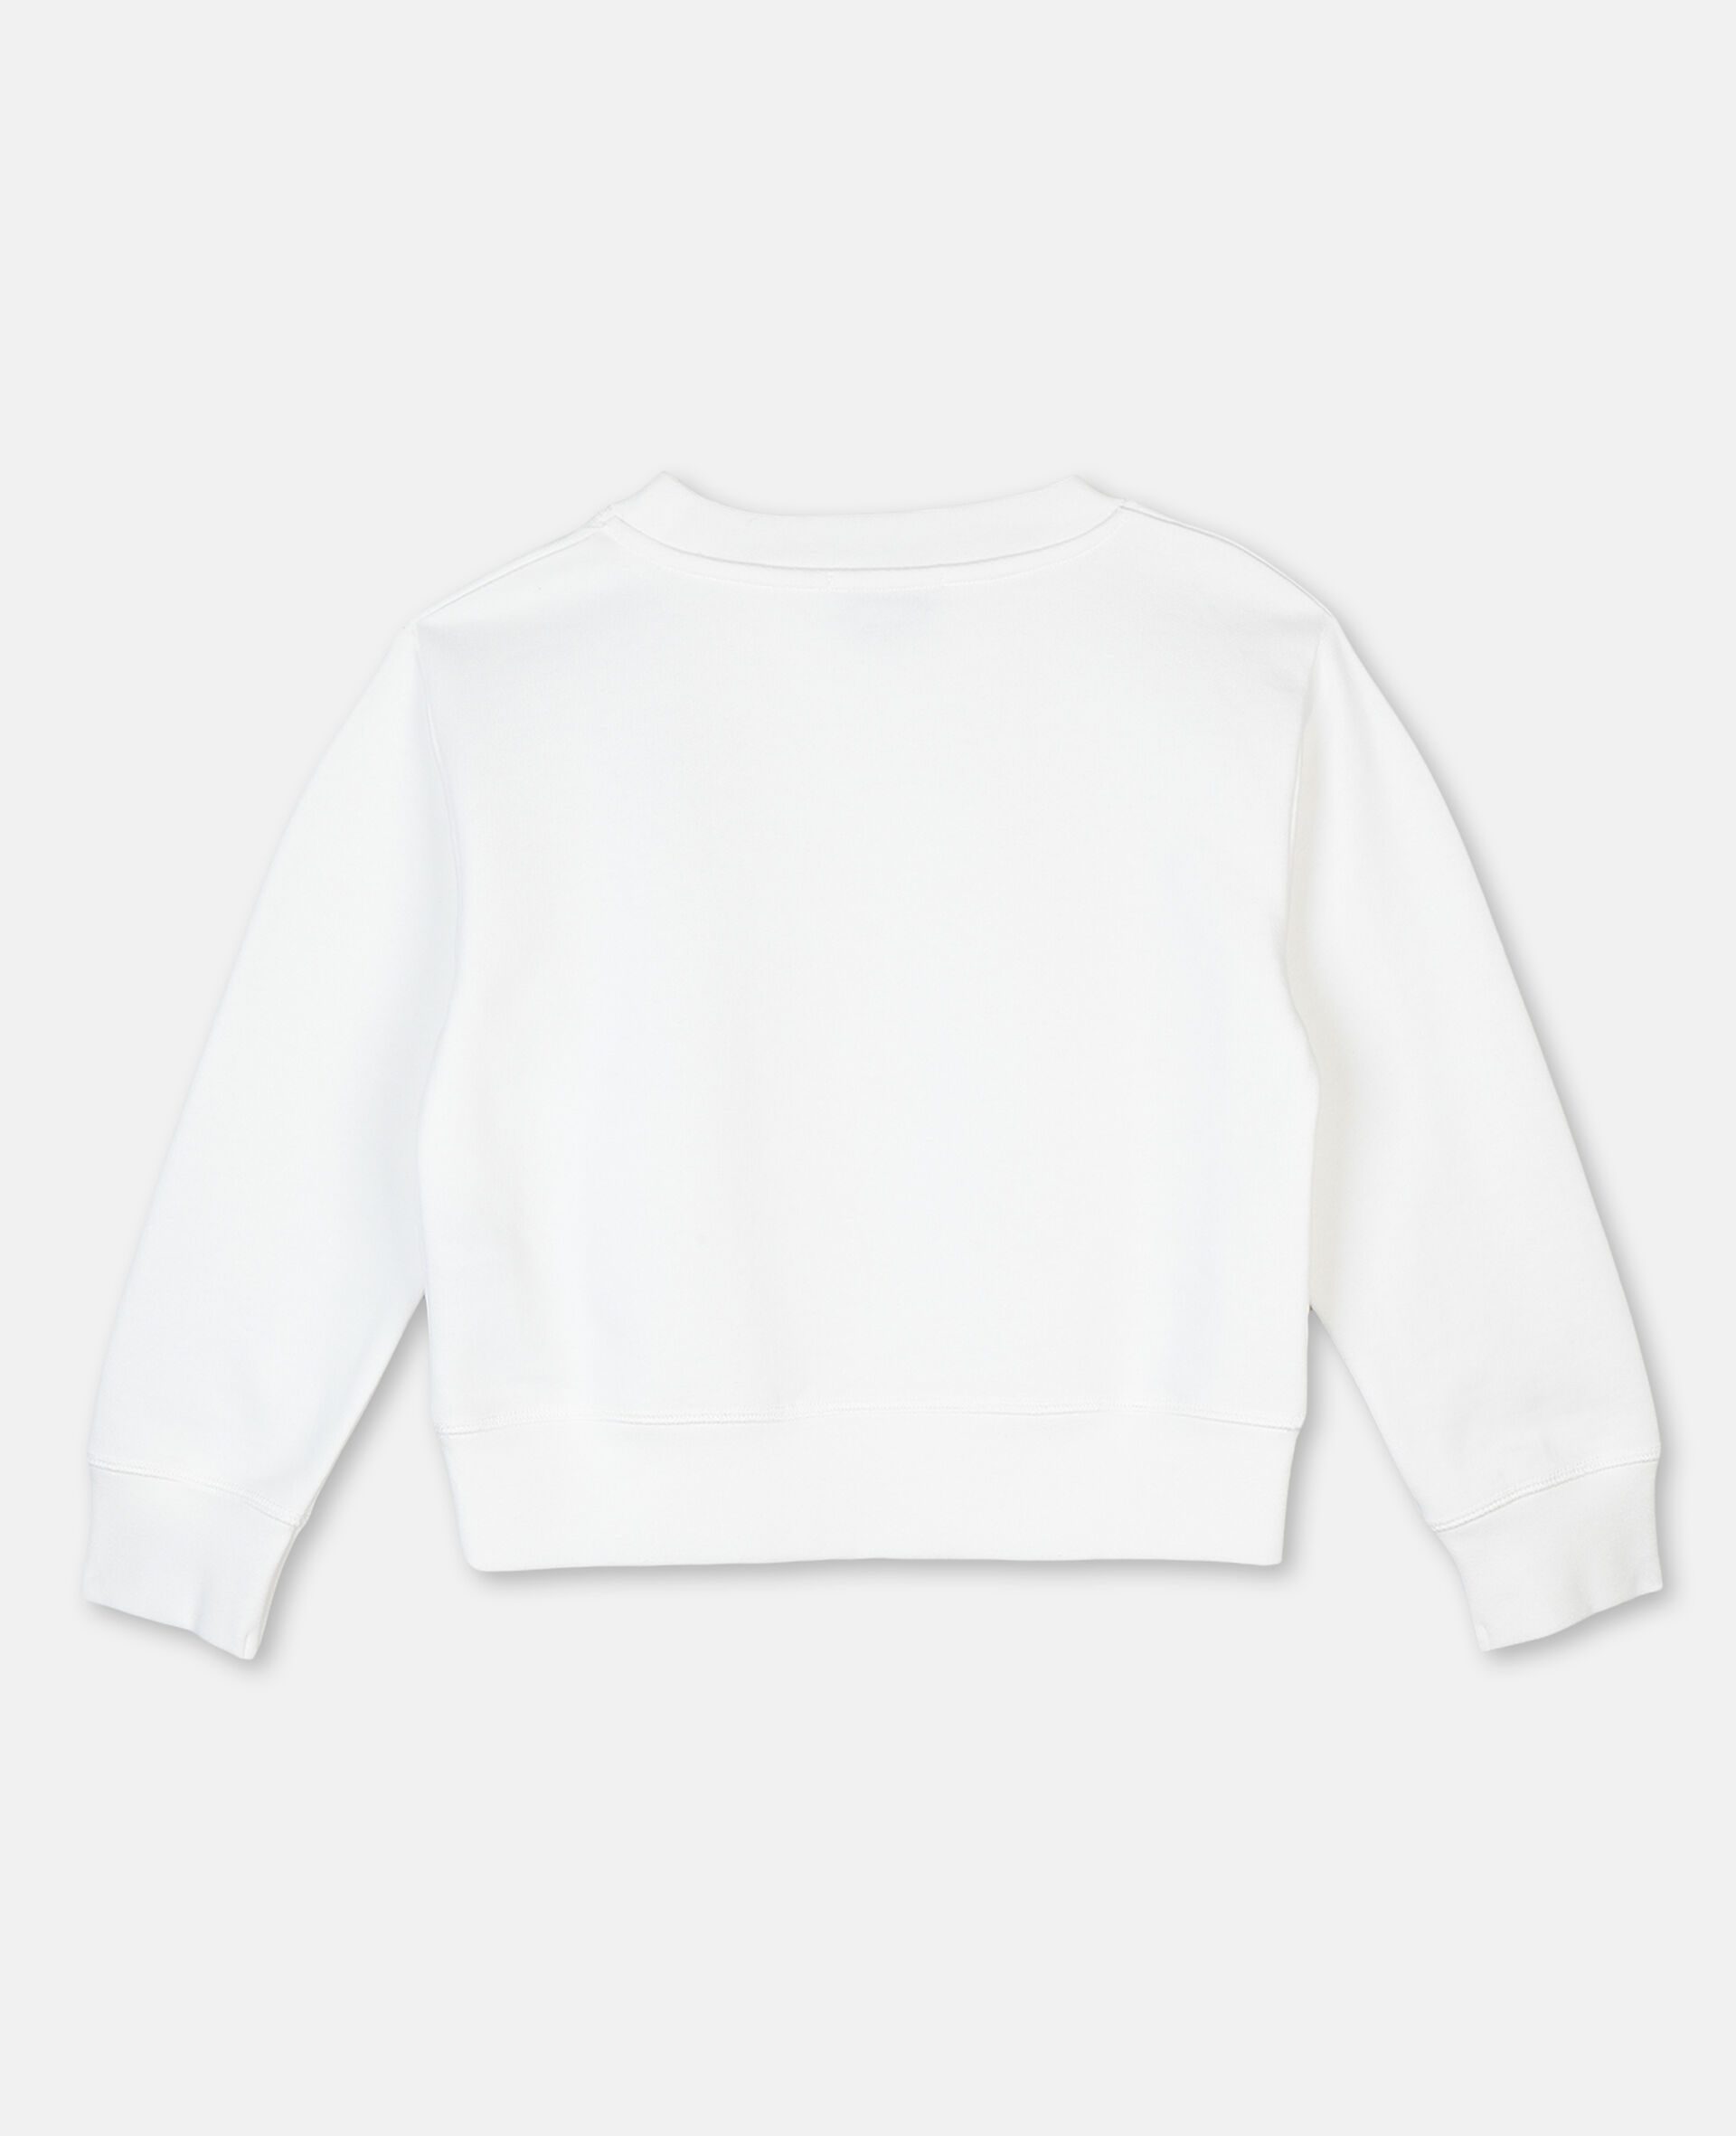 Palm Cotton Fleece Logo Sweatshirt -White-large image number 3